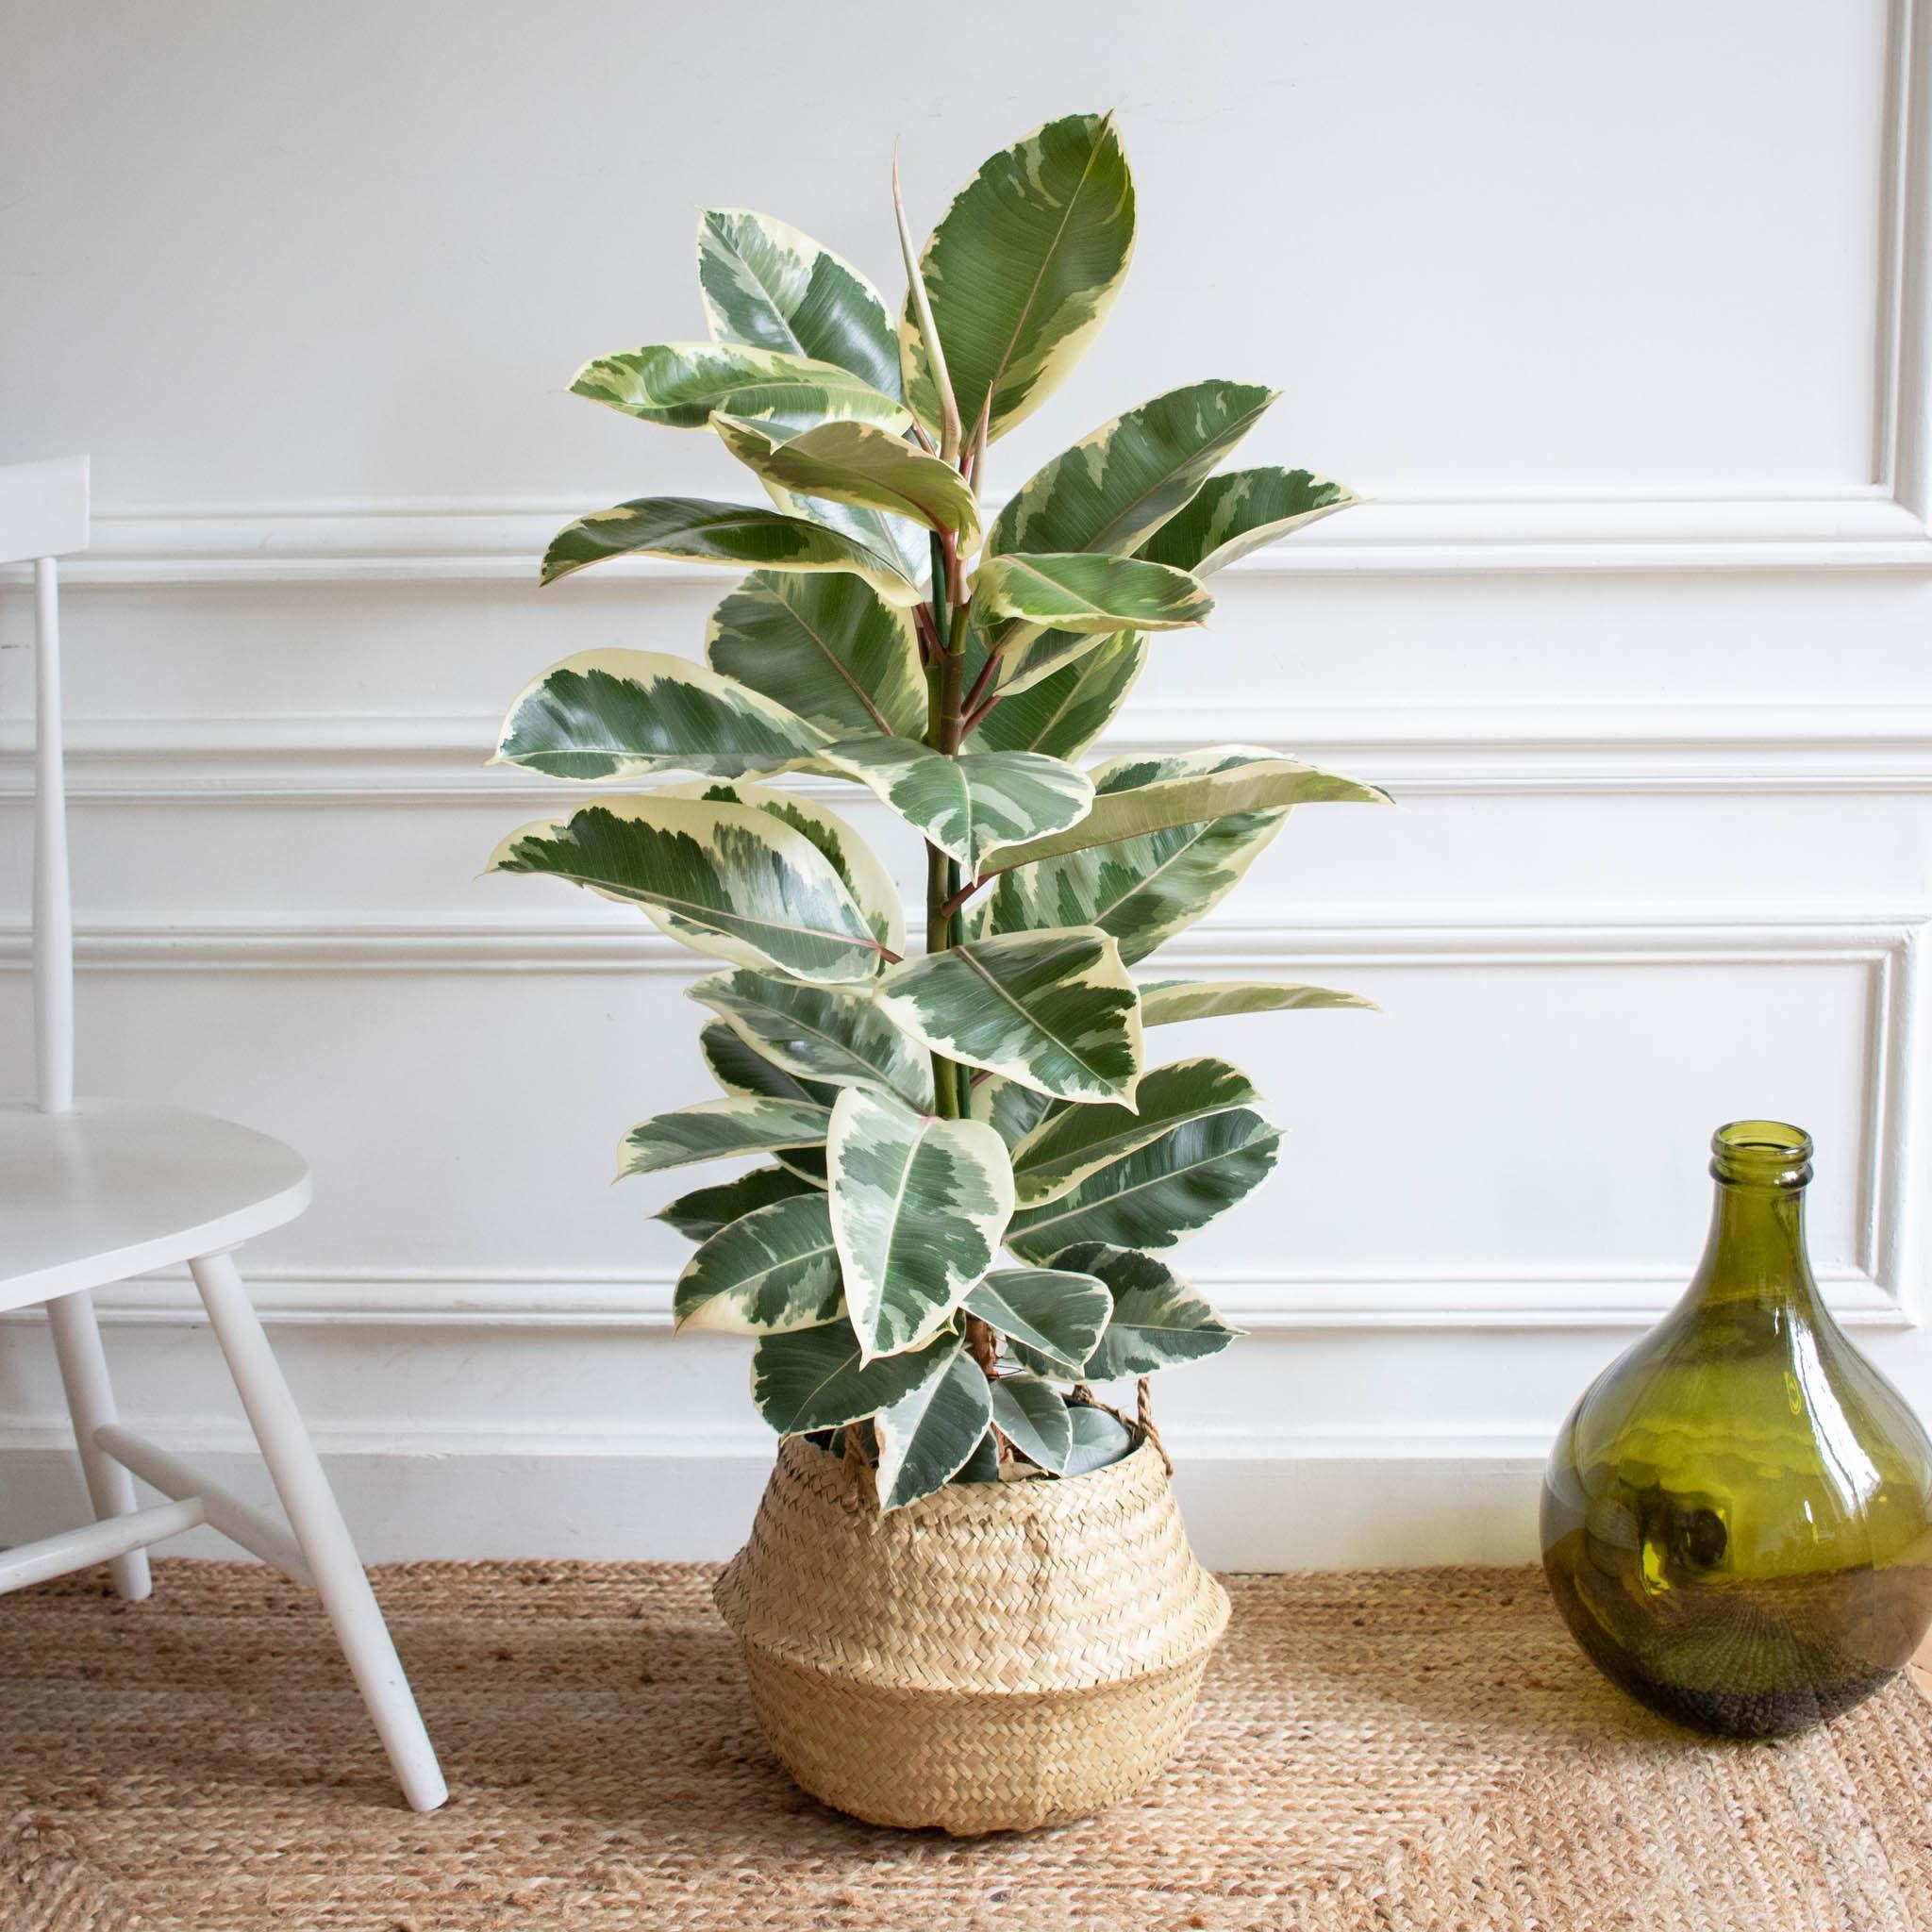 Albert et son panier naturel - Ficus 'Tineke'